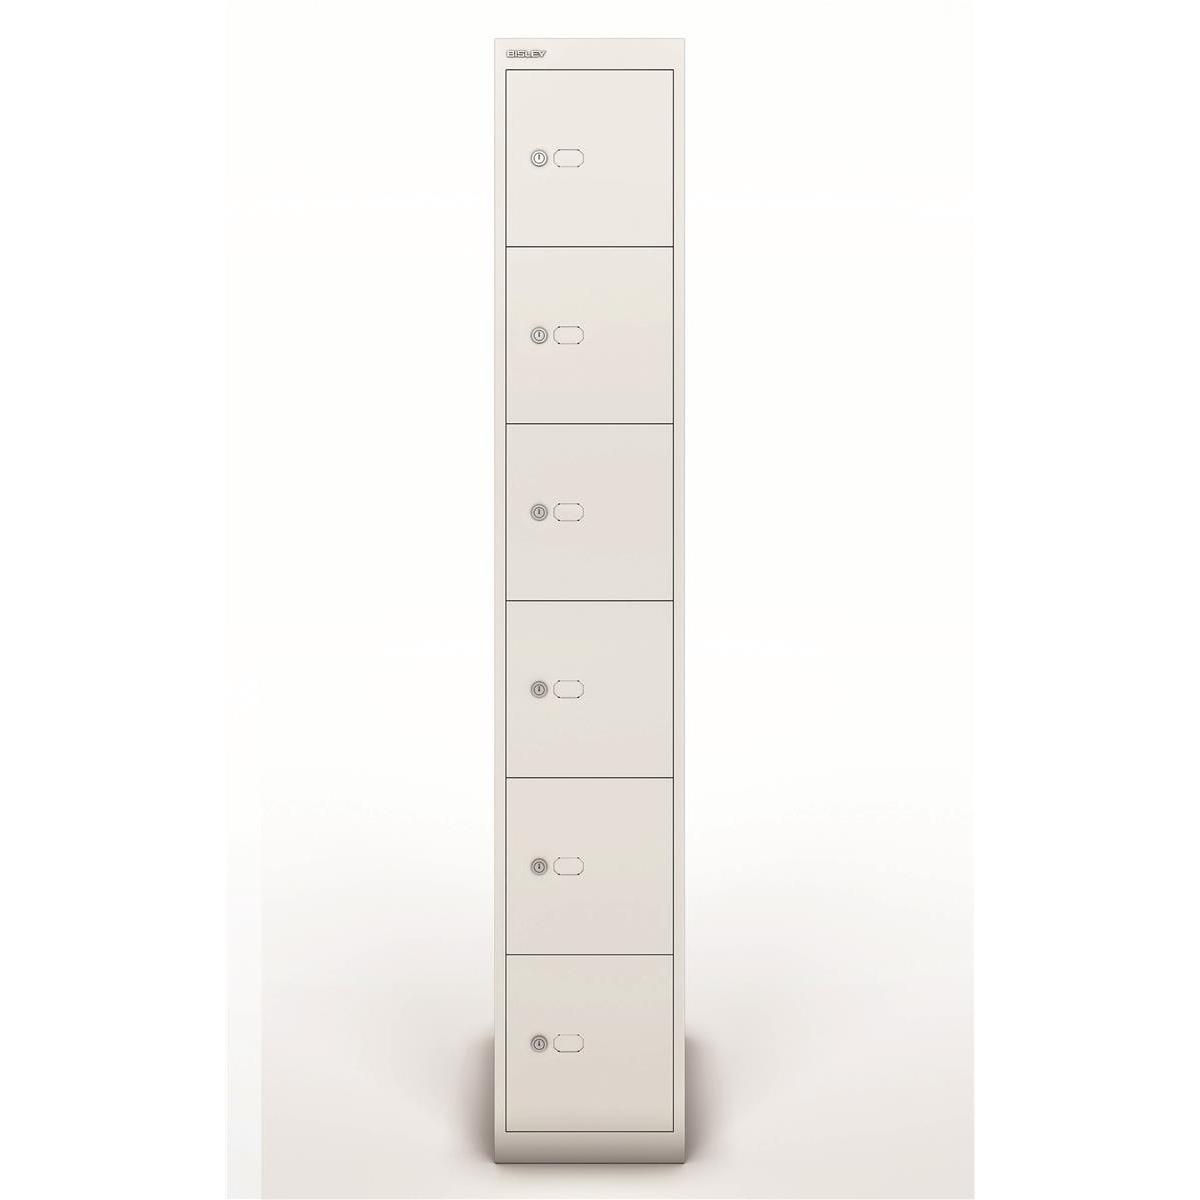 Lockers Bisley Locker 6 Door White 457d Ref CLK186-ab9